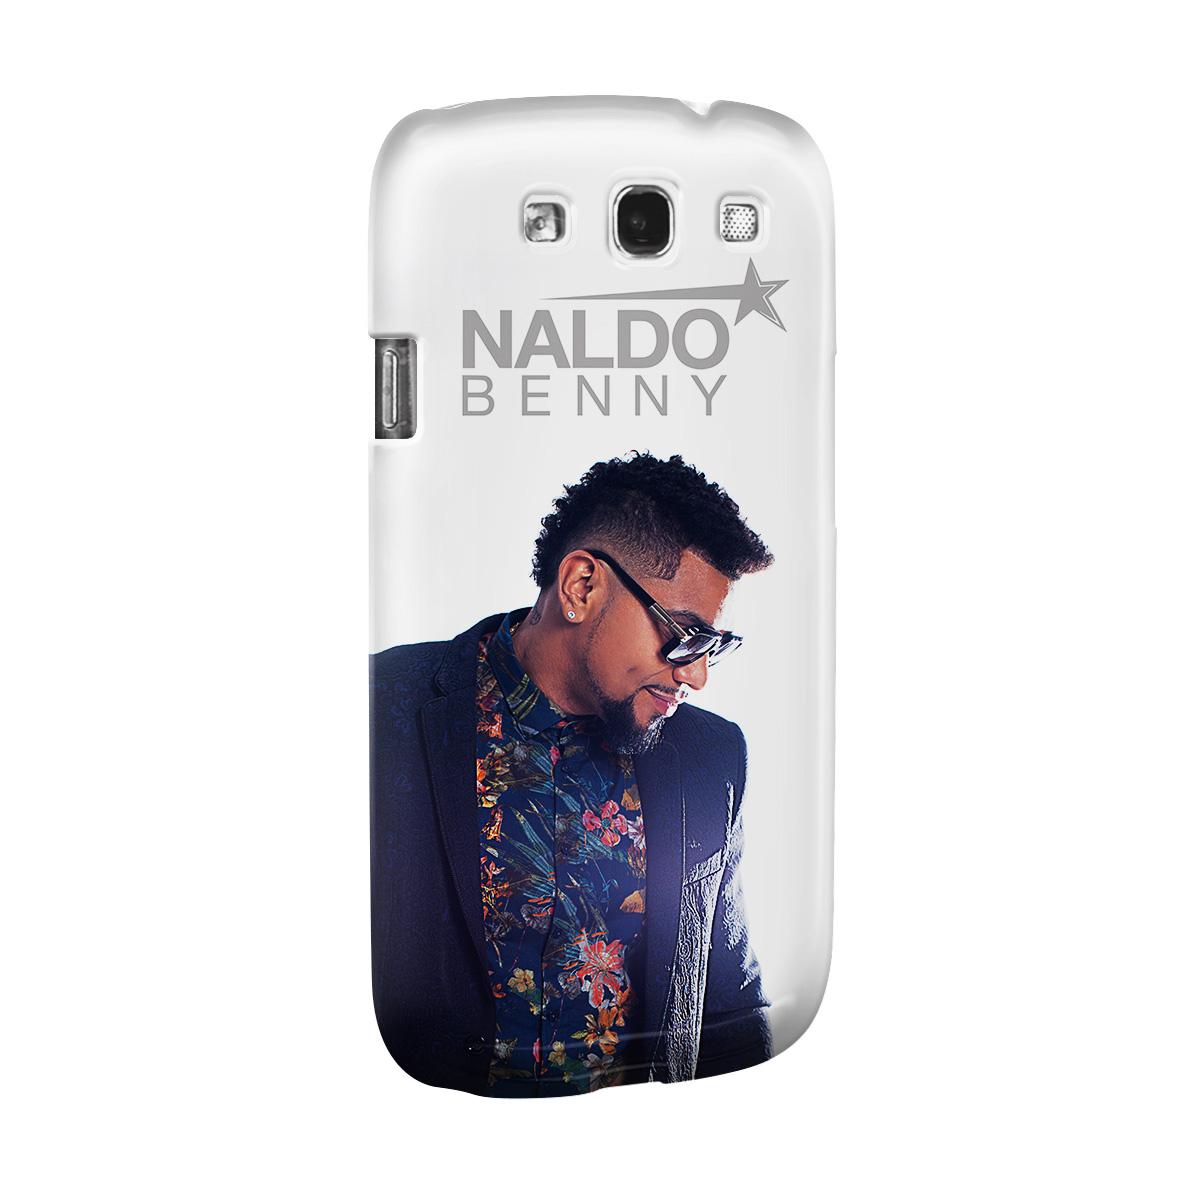 Capa para Samsung Galaxy S3 Naldo Benny Photo